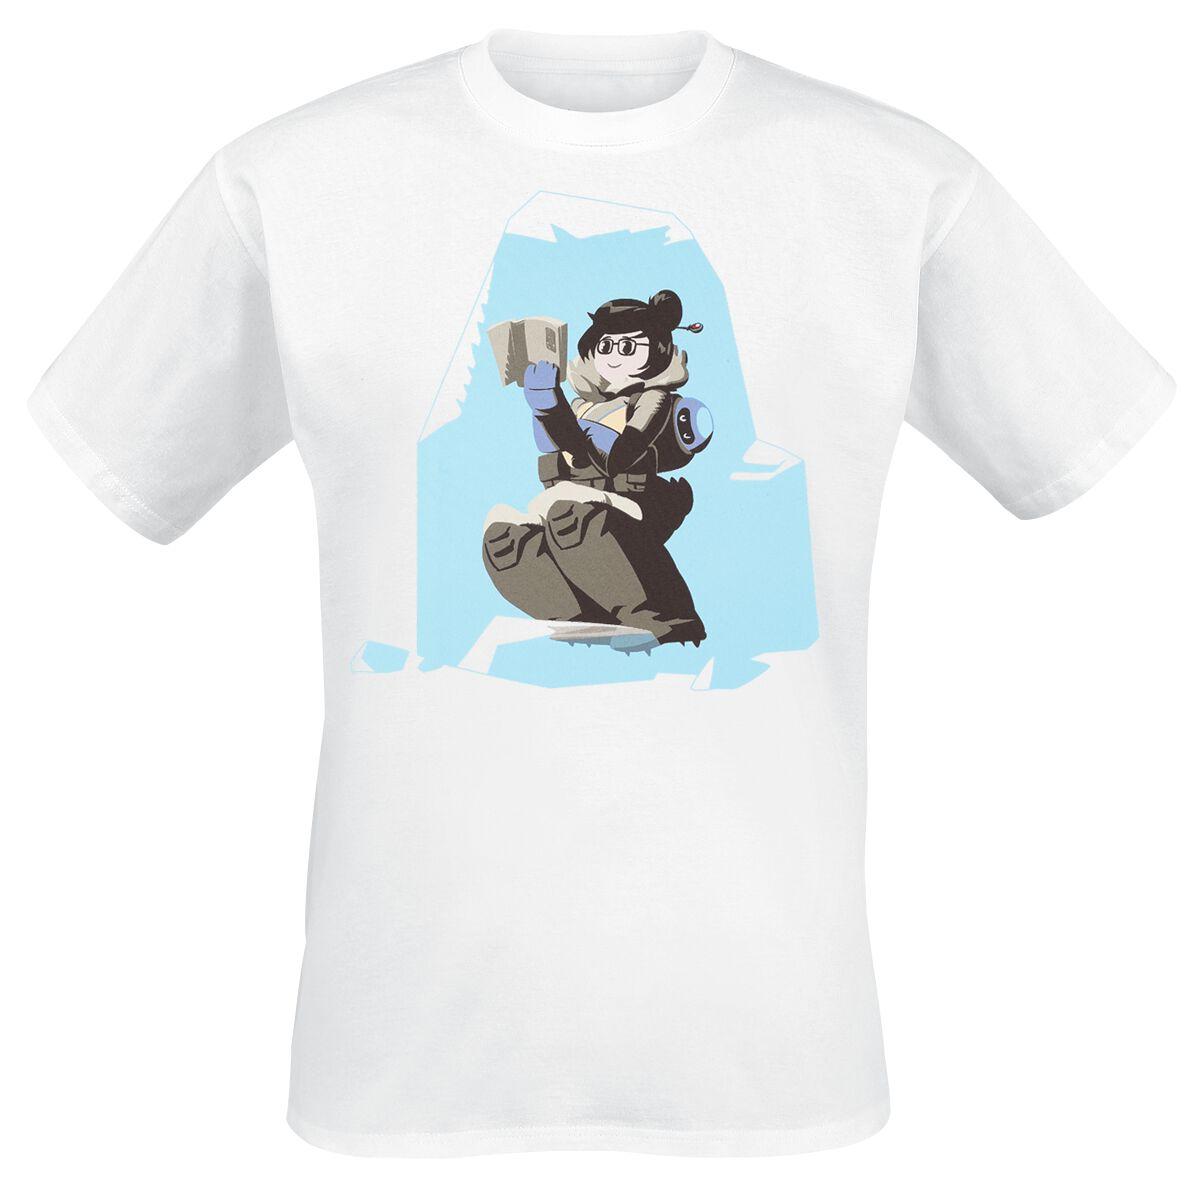 Overwatch Mei T-Shirt weiß ABYTEX452